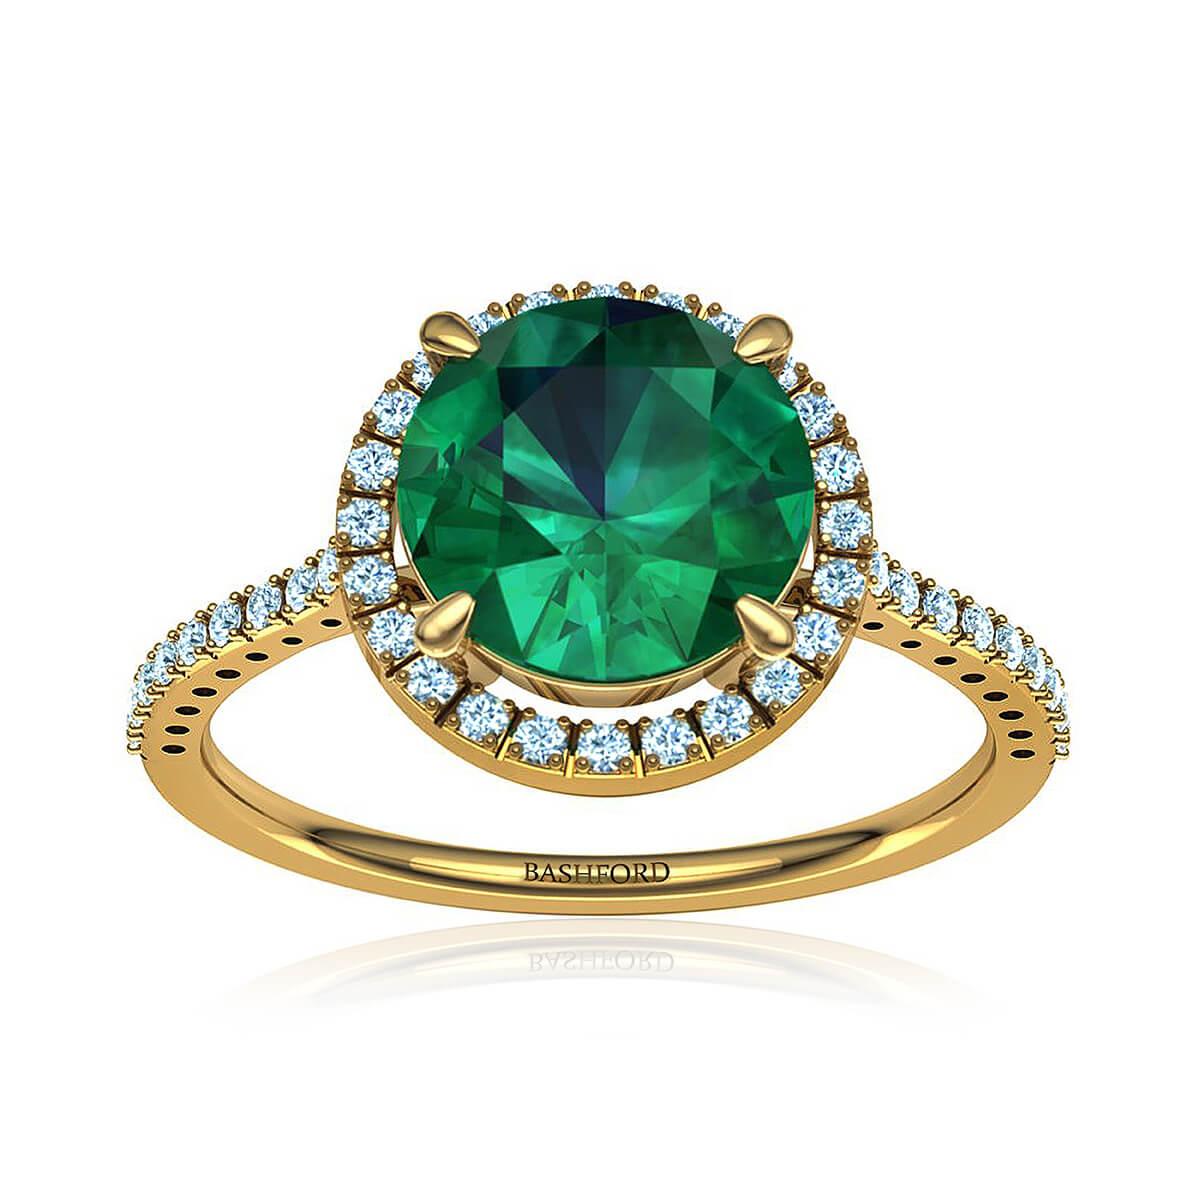 Lolita Emerald Ring (with 3/4 Carat Round Emerald)